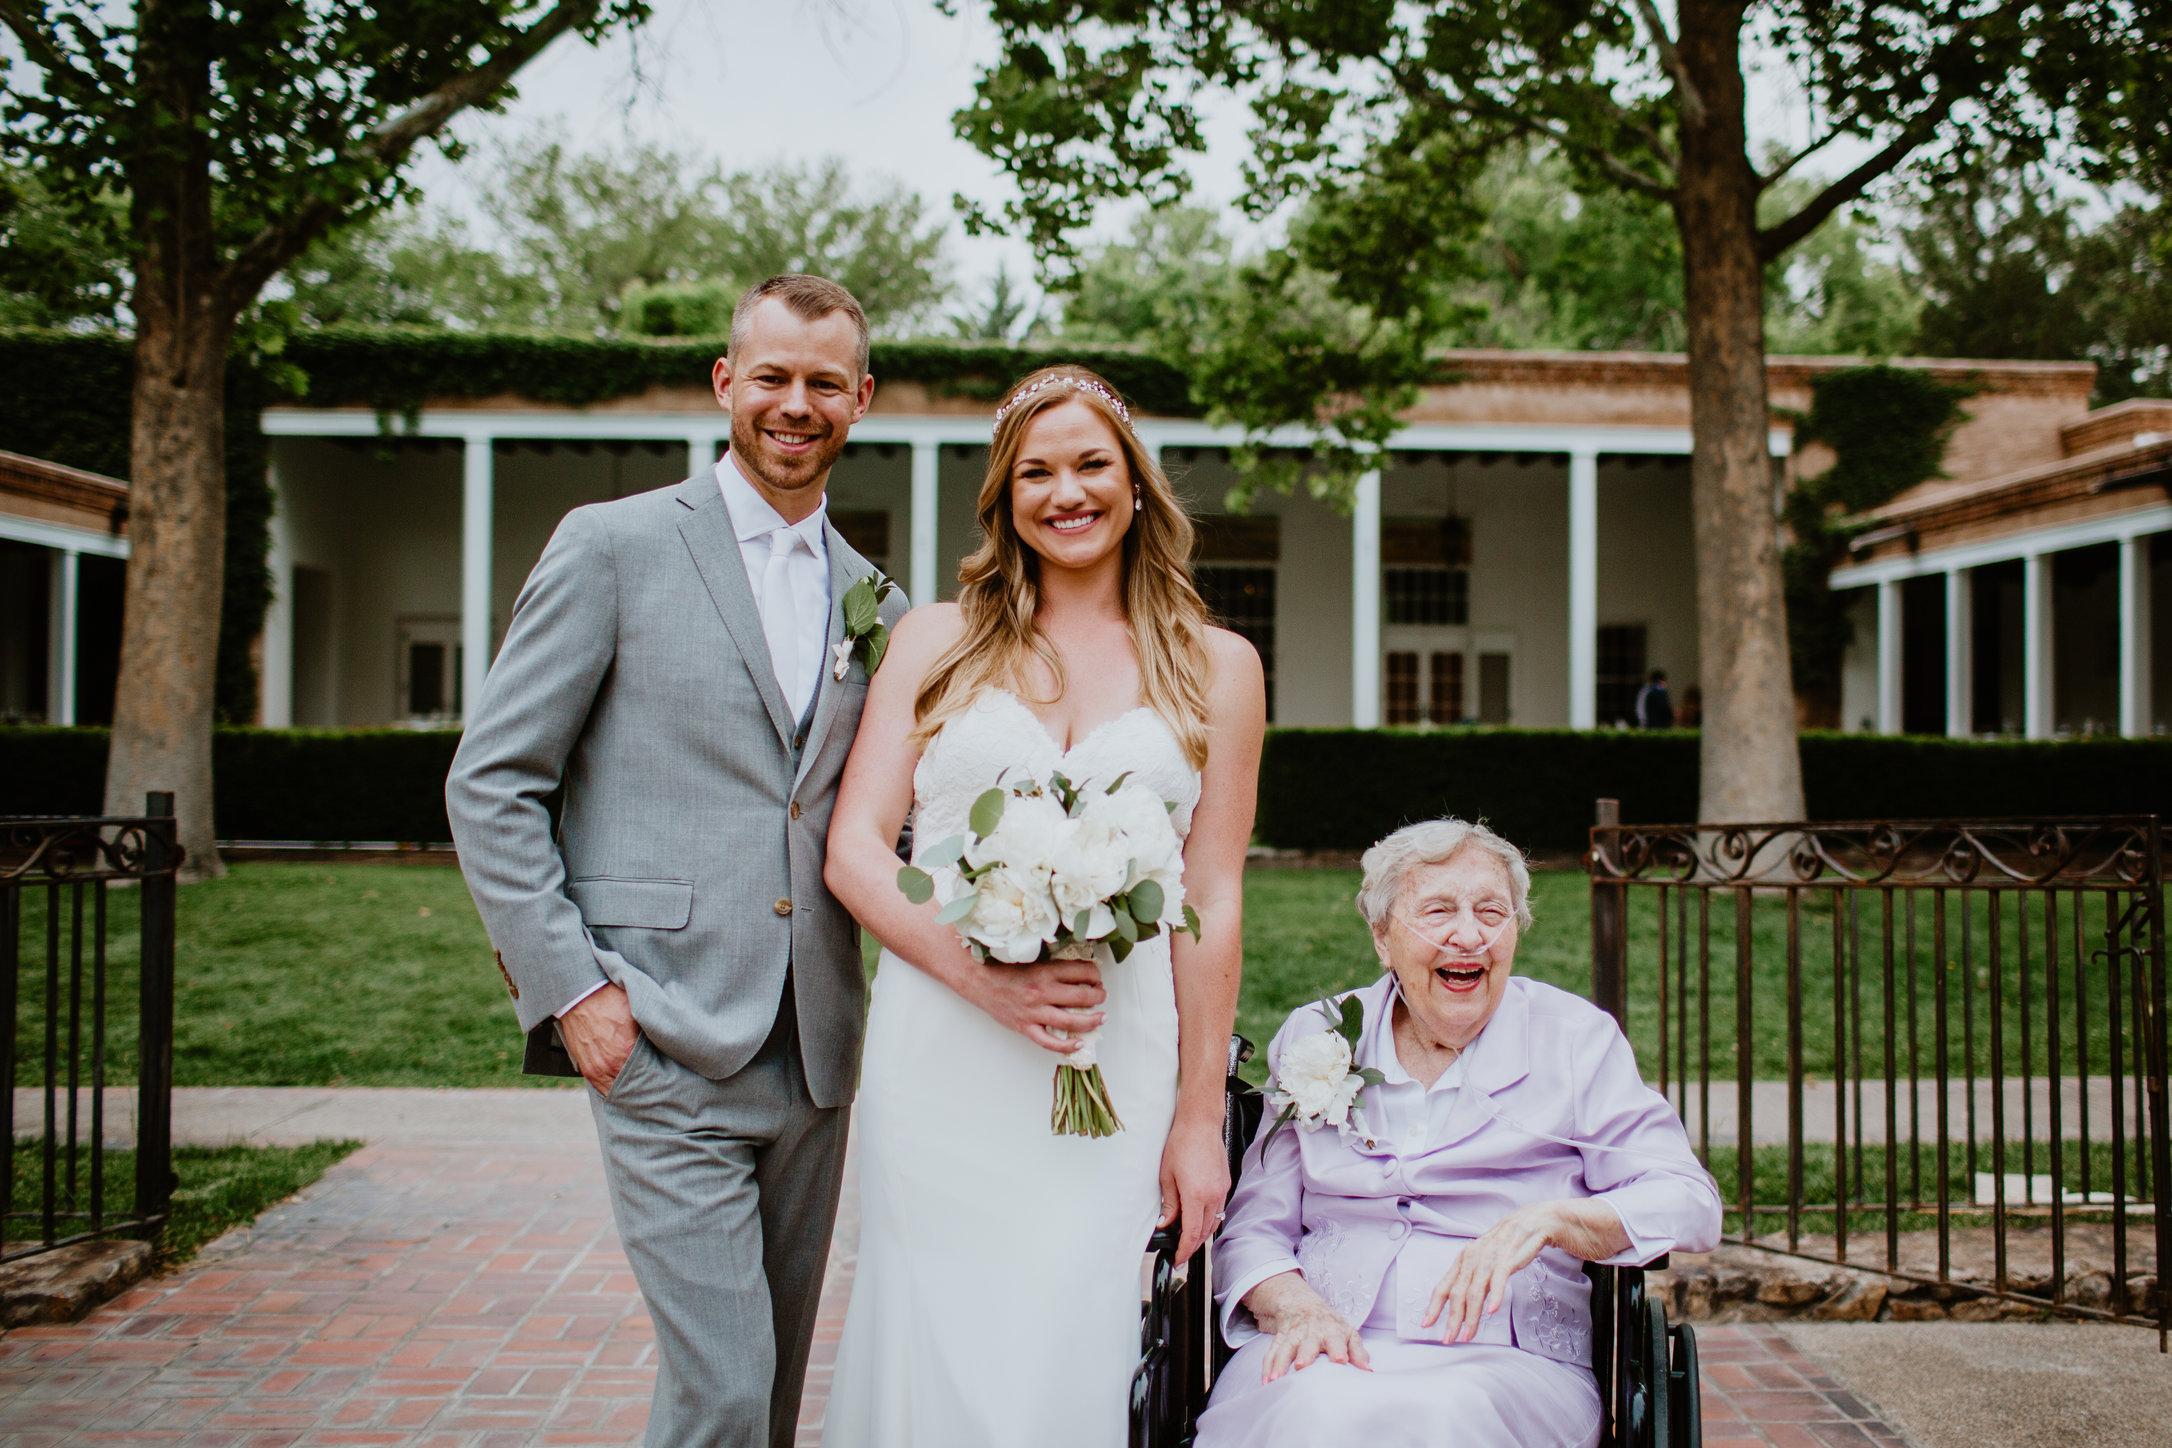 DandA-wedding-456.jpg